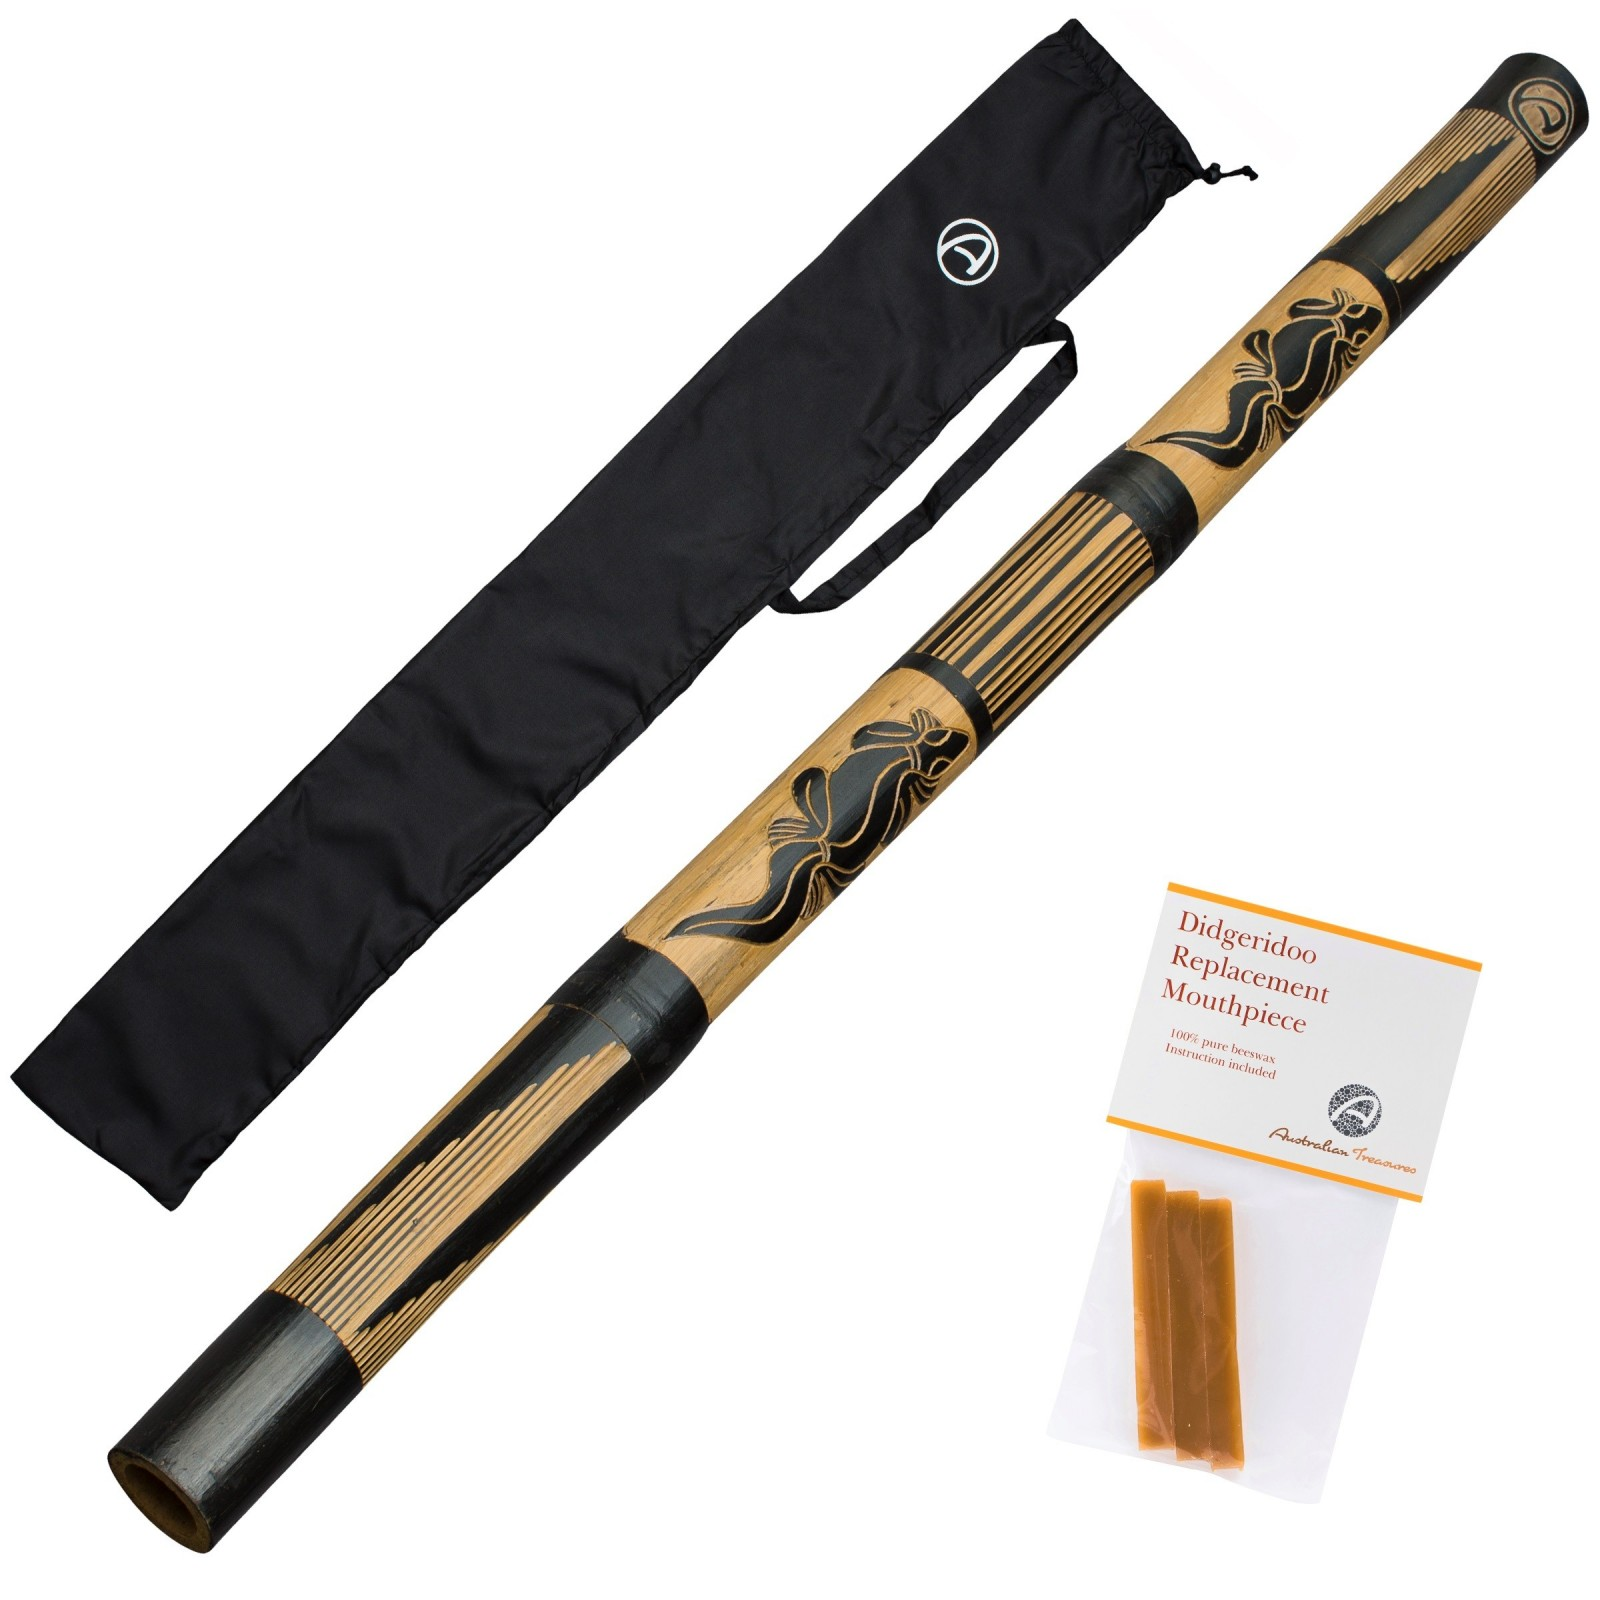 DIDGERIDOO CARVED: didgeridoo en bambou comprenant 3 bandes de cire d'abeille et un sac de didgeridoo en nylon